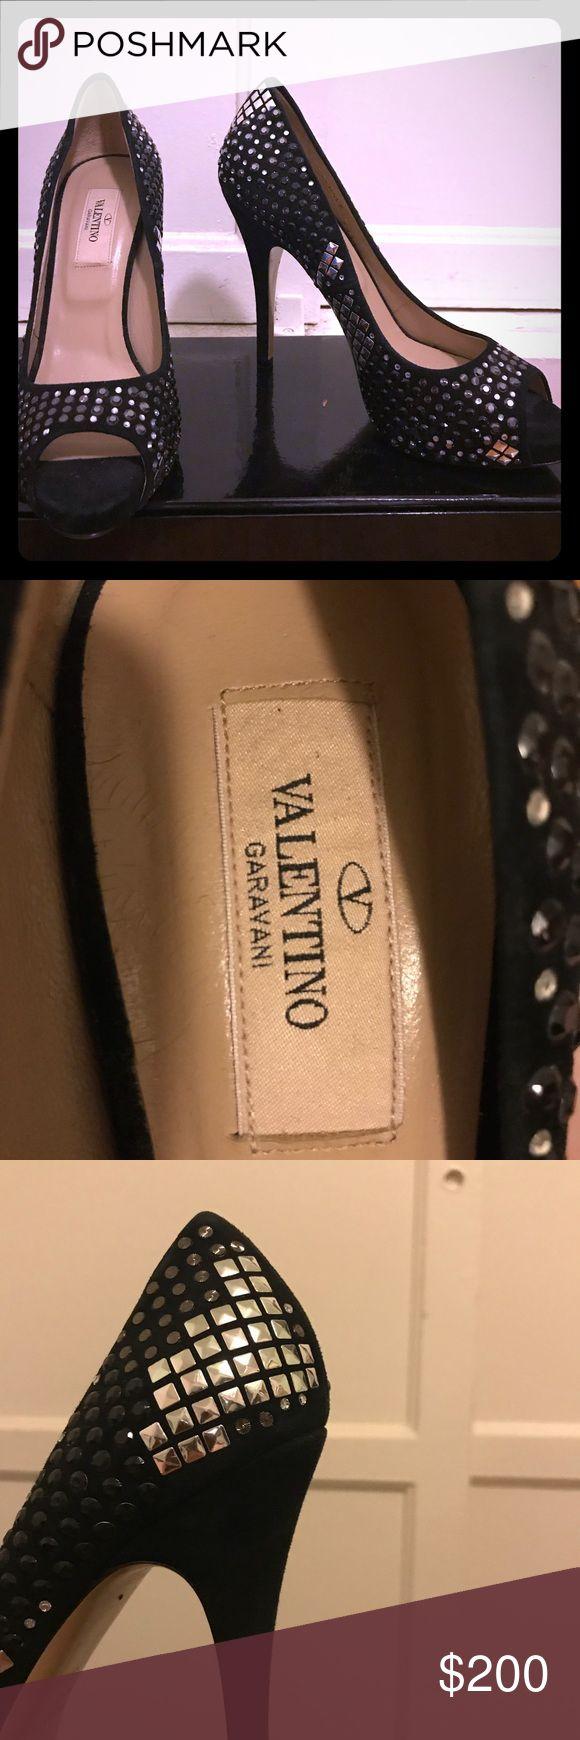 Valentino Peep toe heels Valentino Peep toe heels Valentino Garavani Shoes Heels